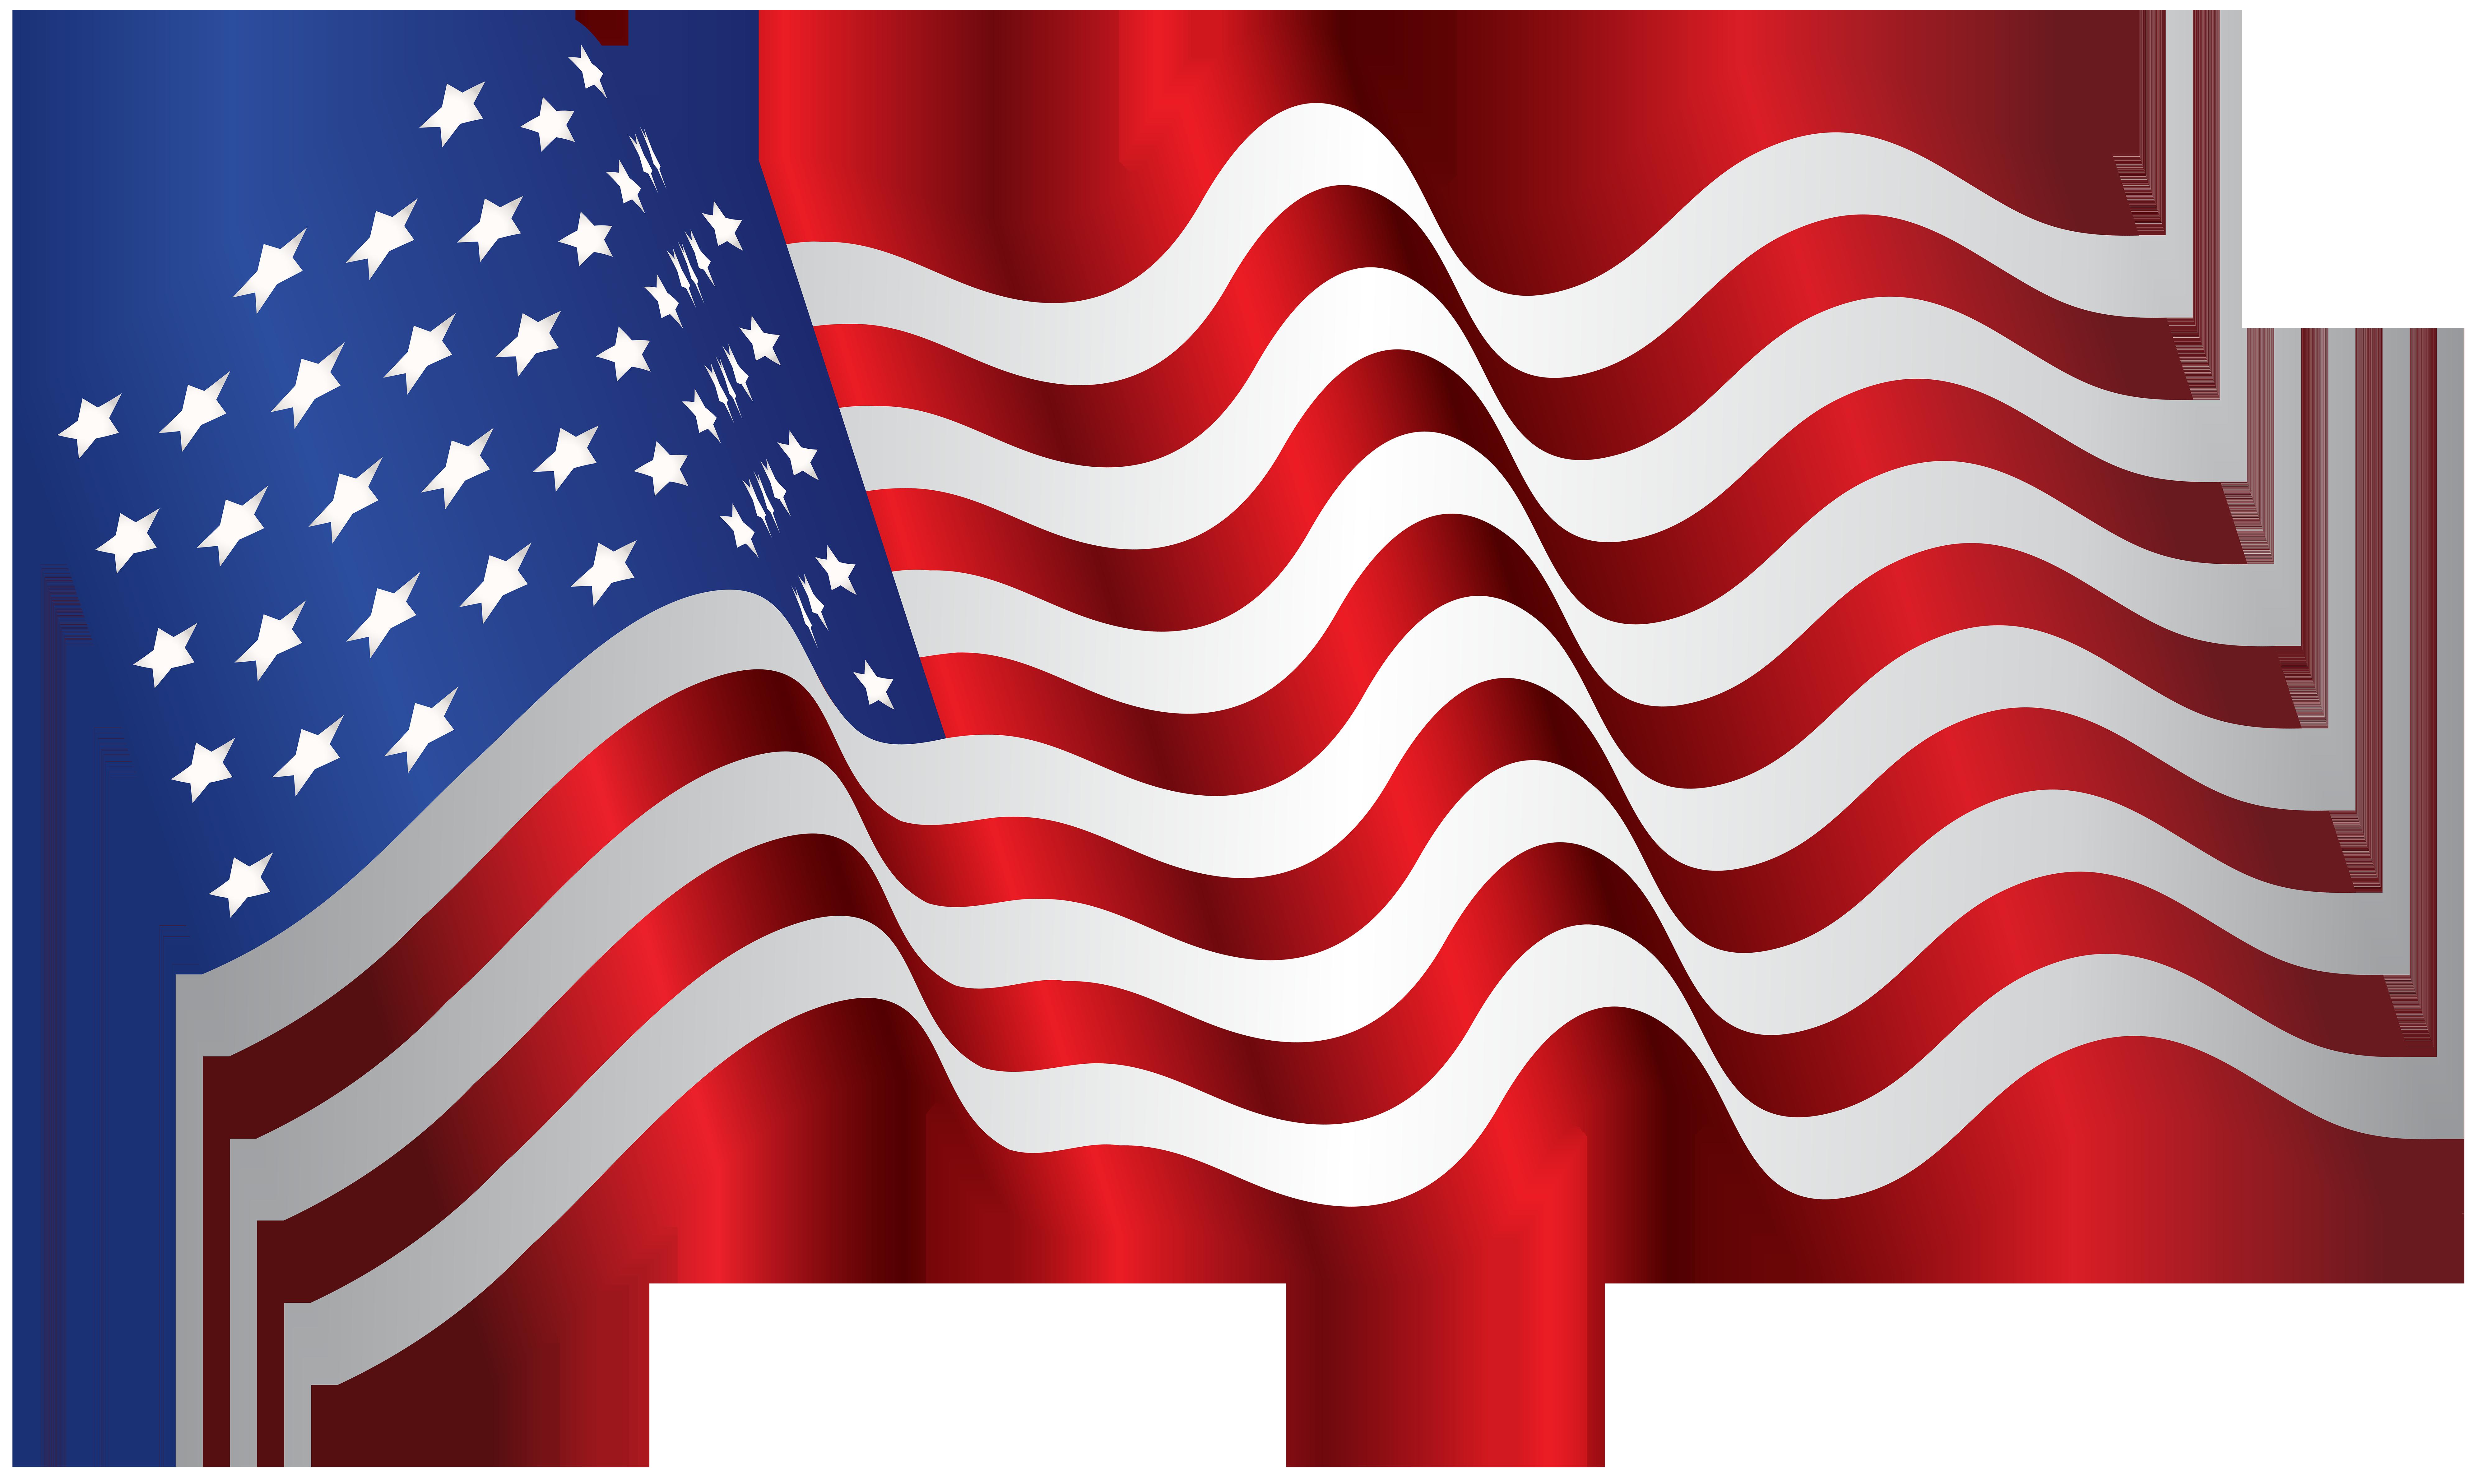 USA America Waving Flag PNG Clip Art Image.